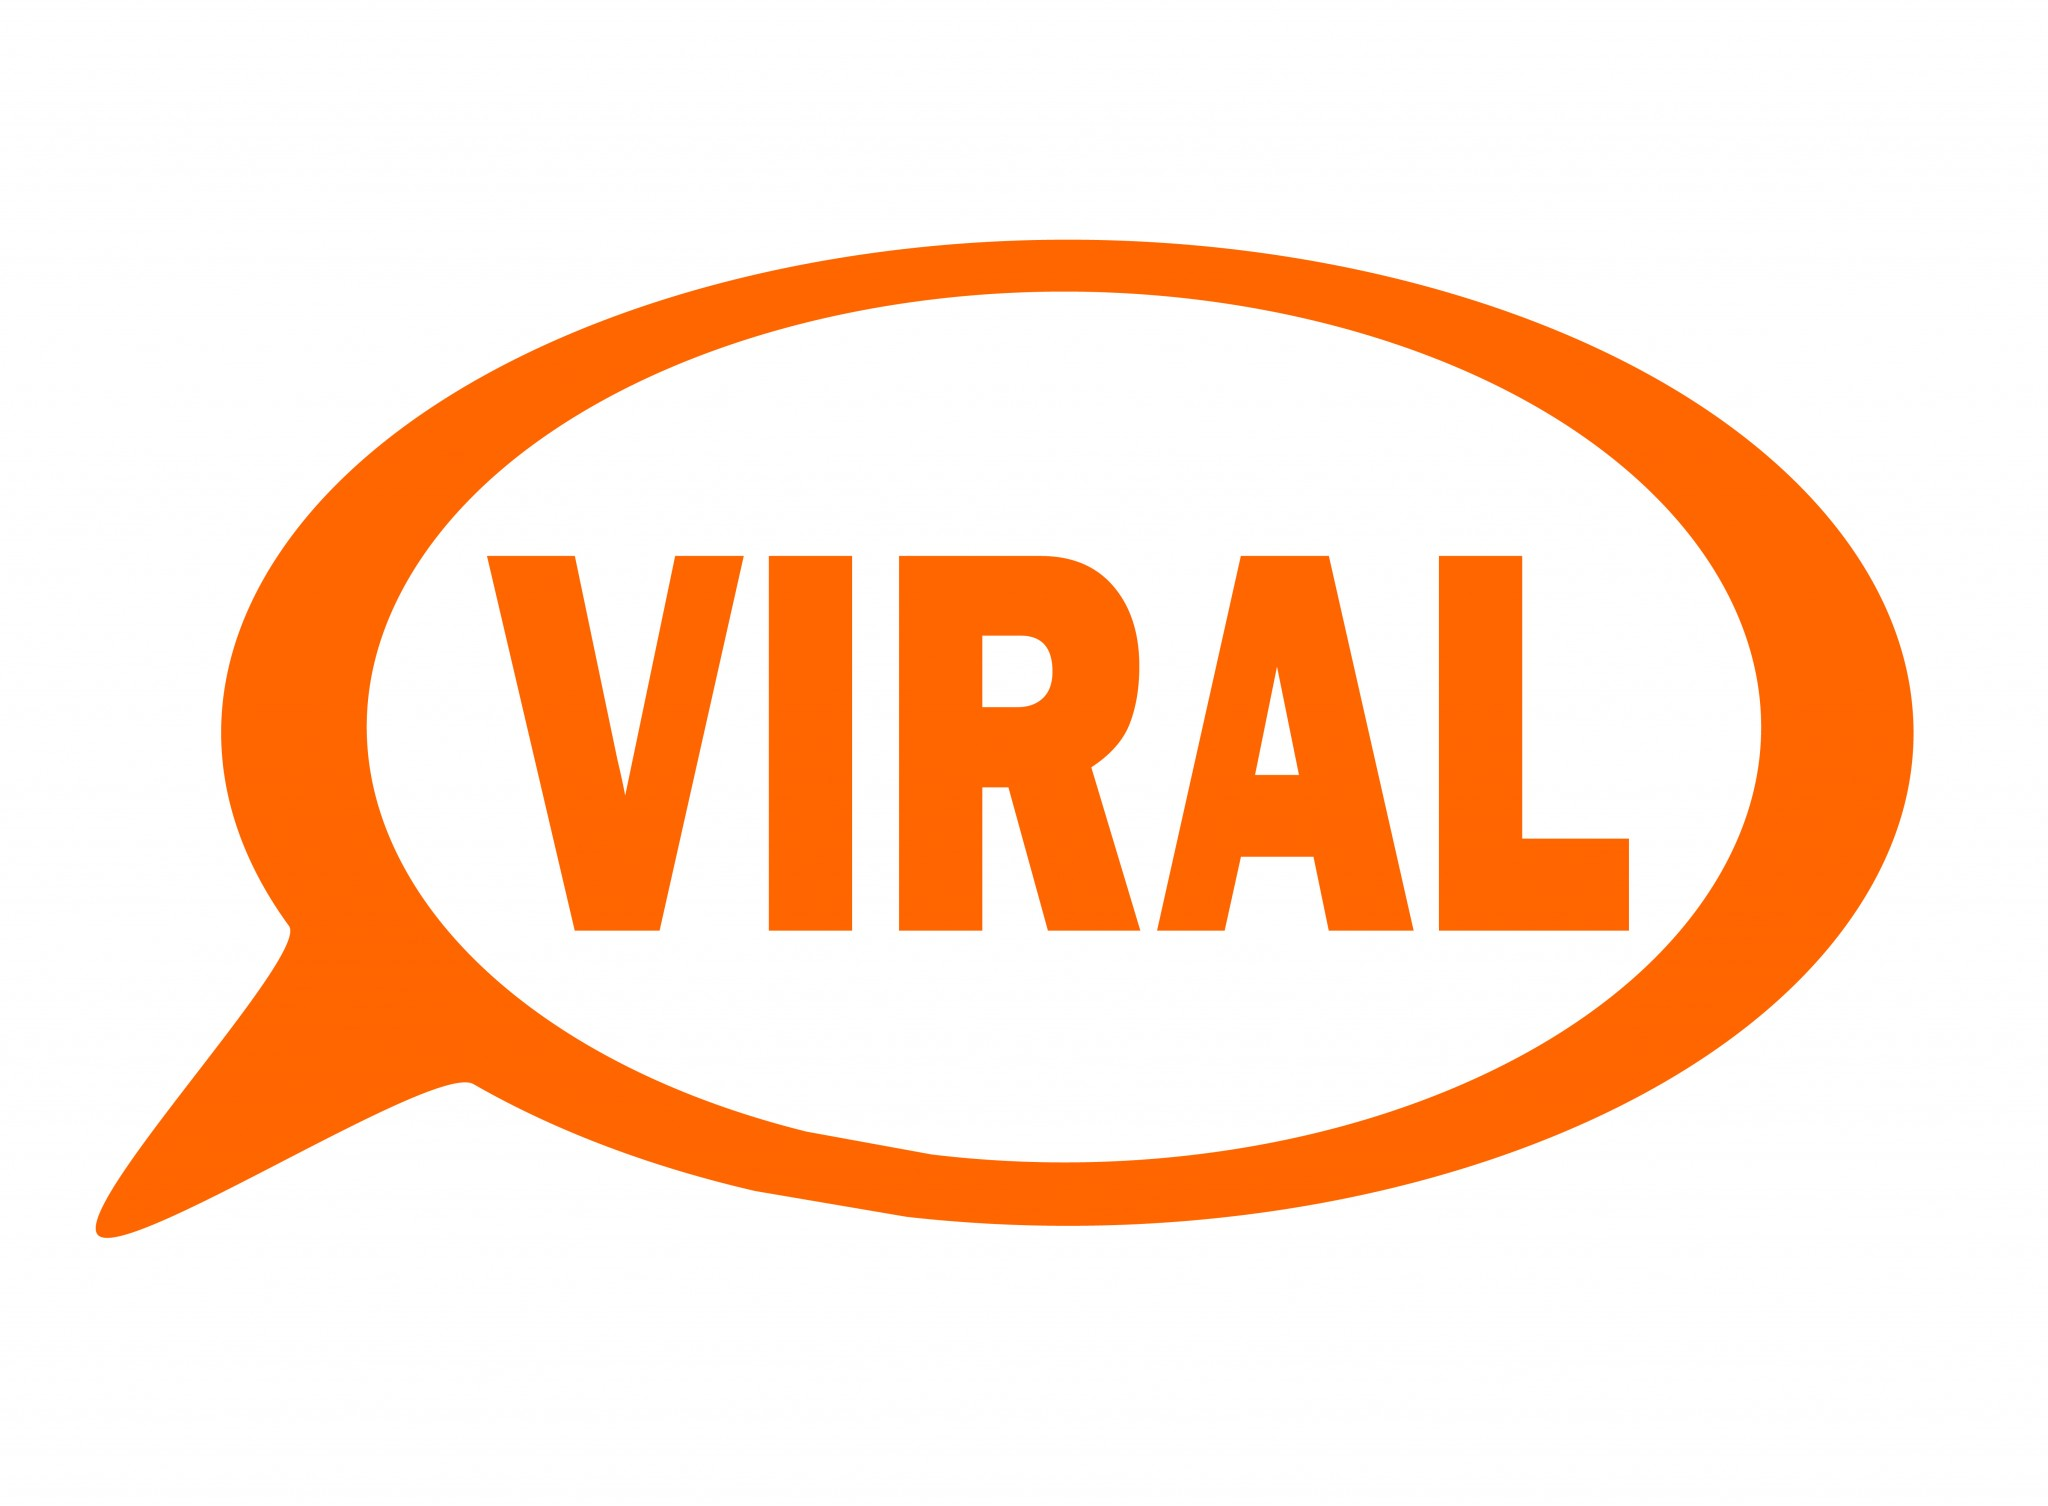 Trucos para viralizar